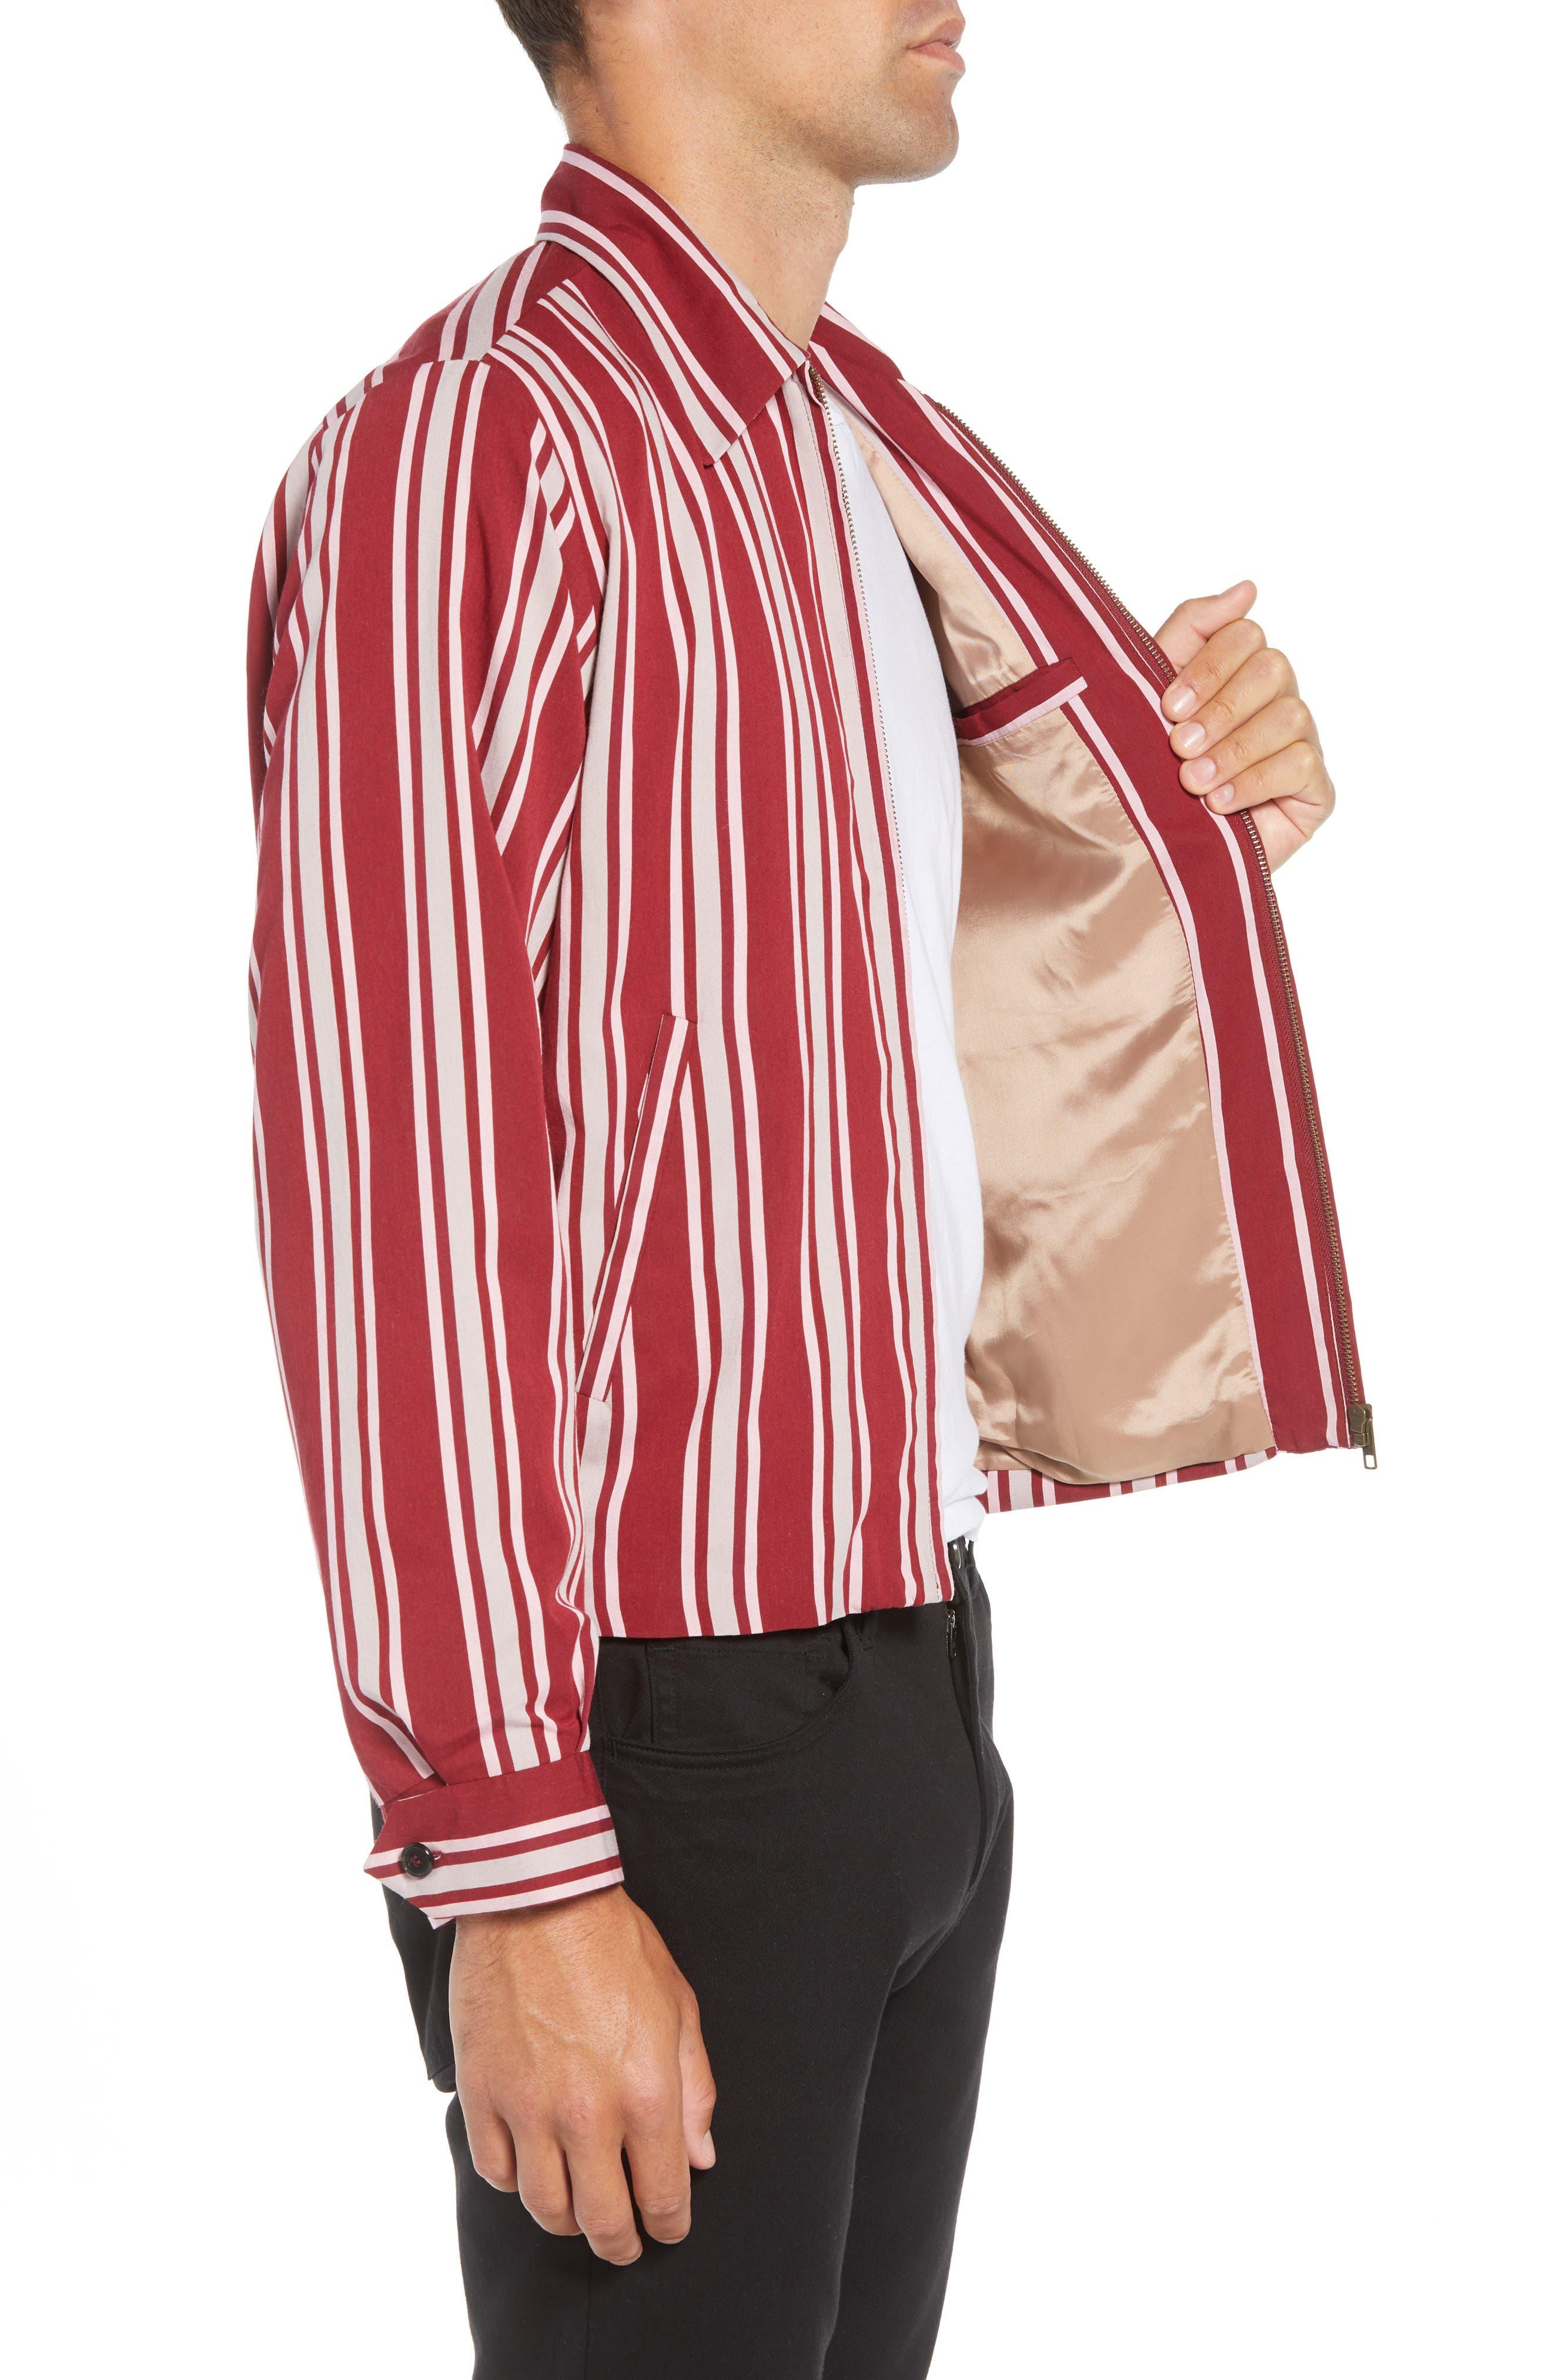 Fifty Regular Fit Shirt Jacket,                             Alternate thumbnail 3, color,                             RED STRIPE